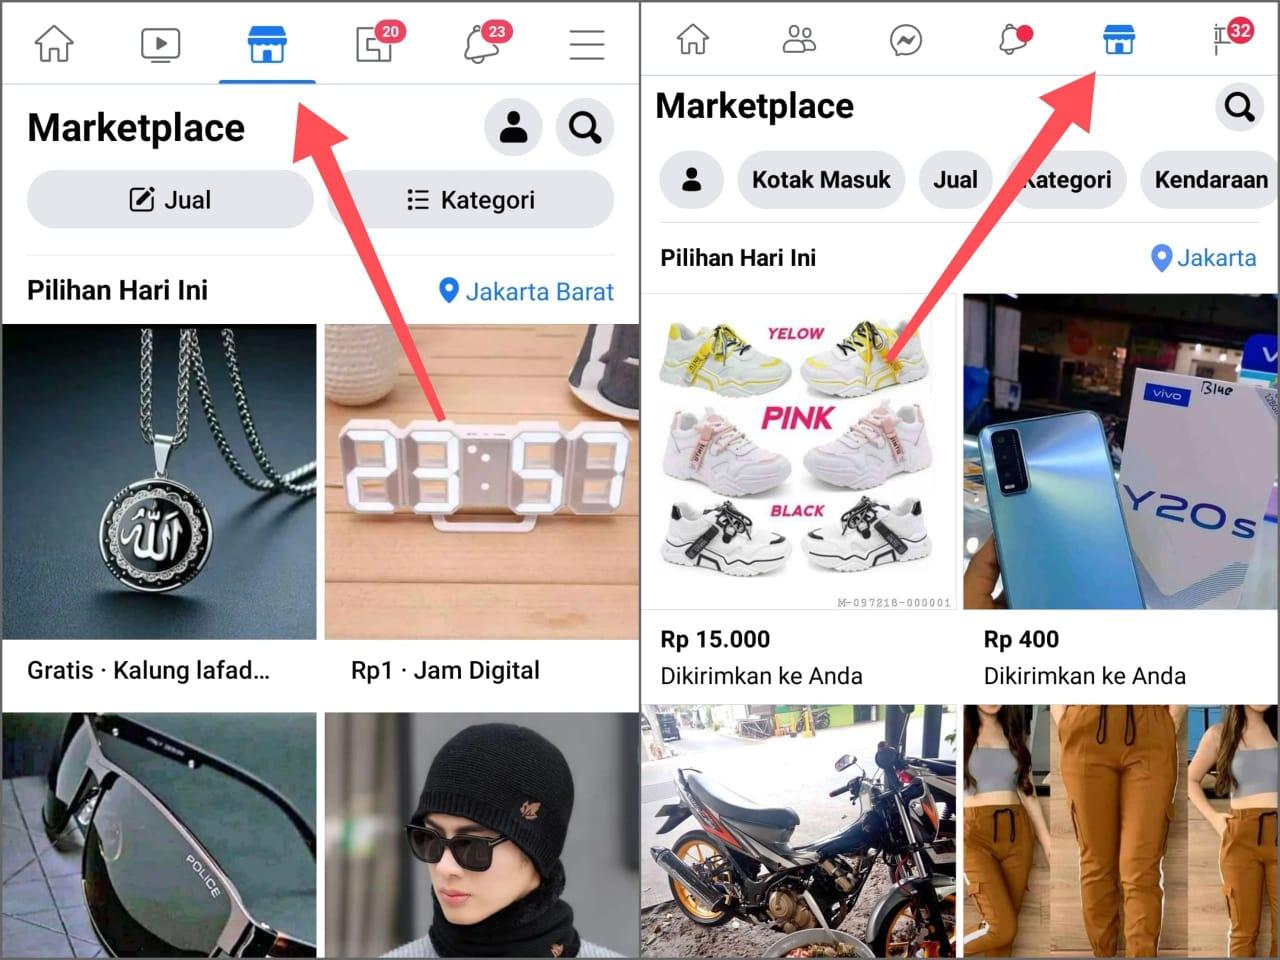 Cara Mengaktifkan Marketplace Facebook Terbaru 2021